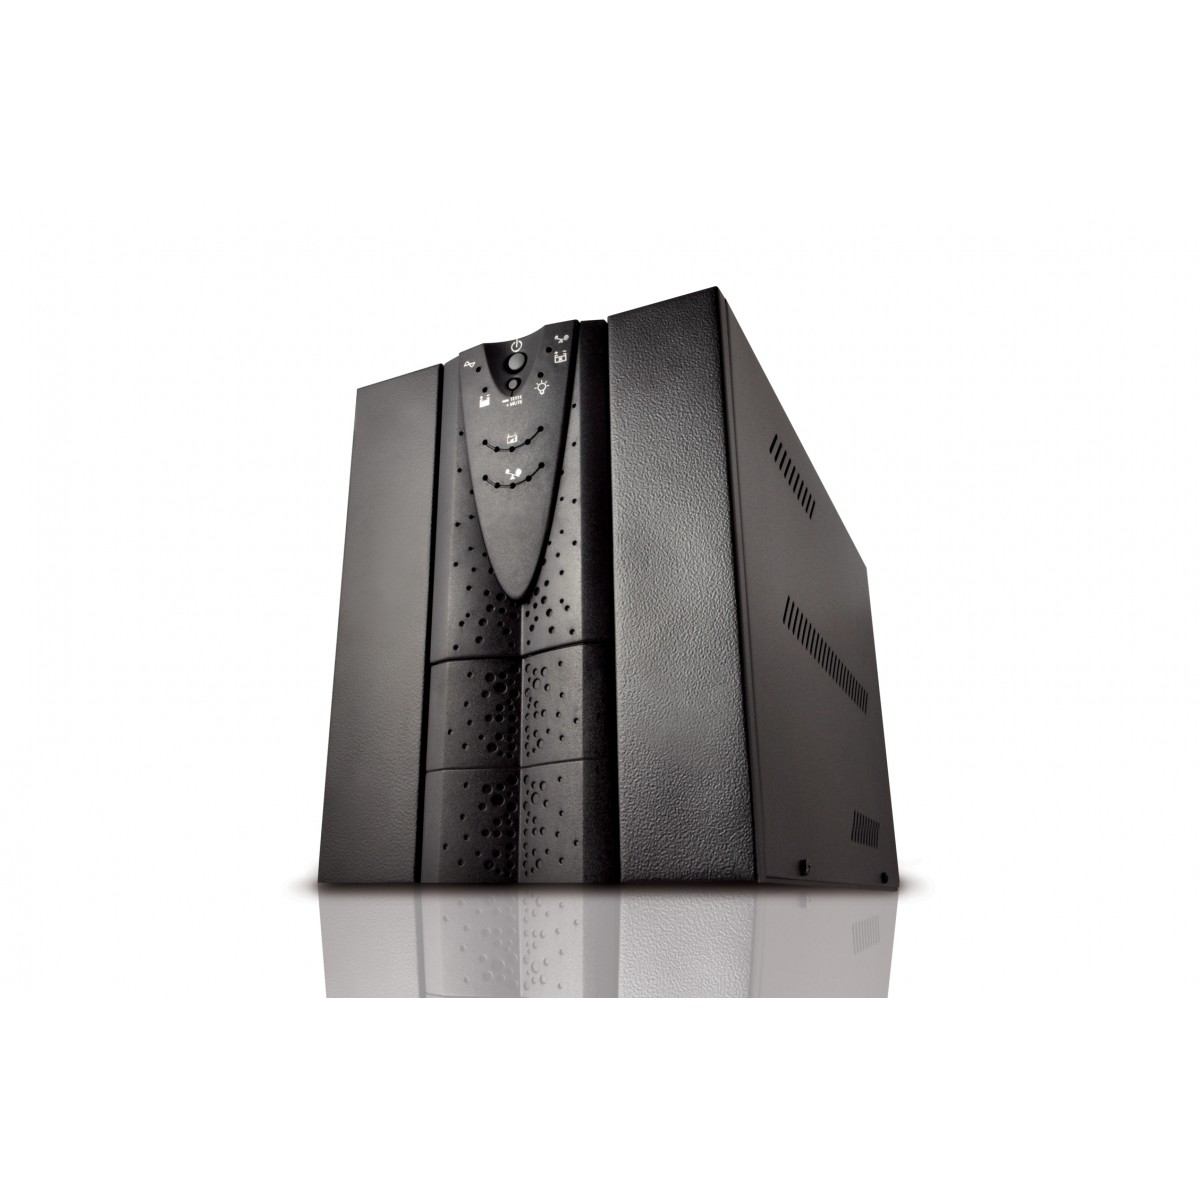 Nobreak Senoidal Magic Power II Enermax 3000 E-biv. Autom. S/115v